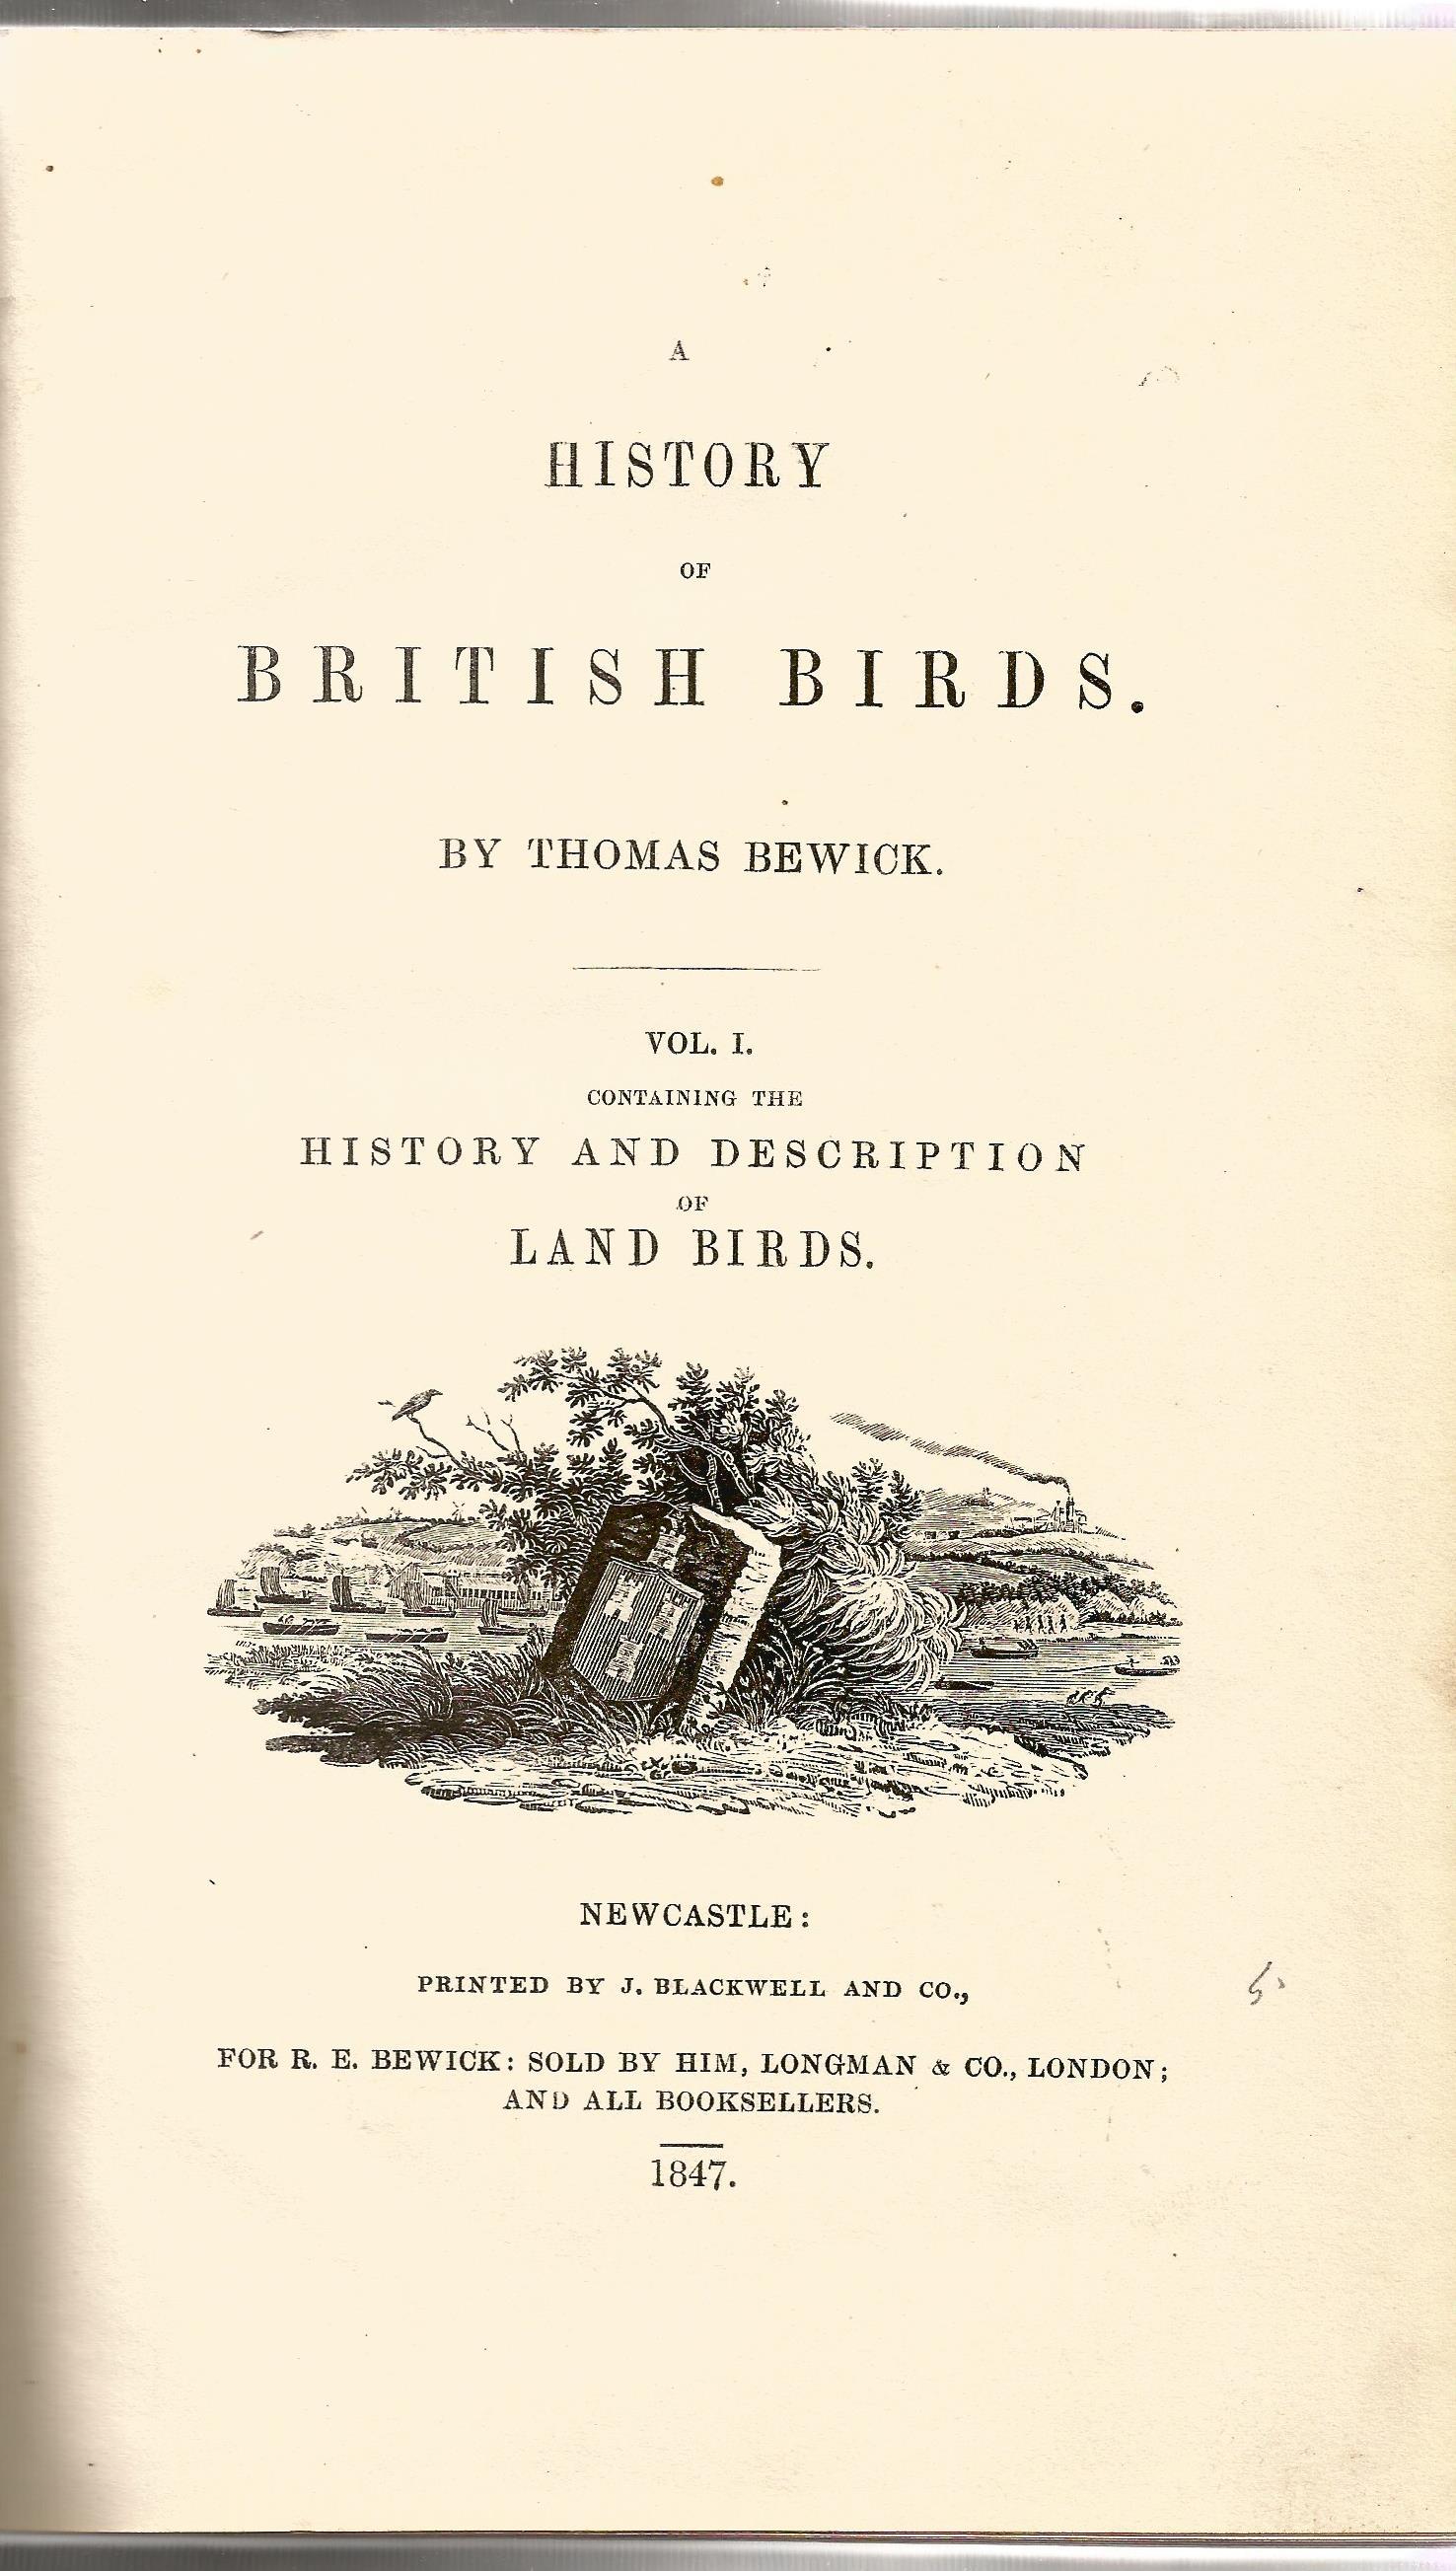 2 Hardback Books Bewick Birds A History of British Birds by Thomas Bewick 1847 Full Leather Bindings - Image 2 of 5